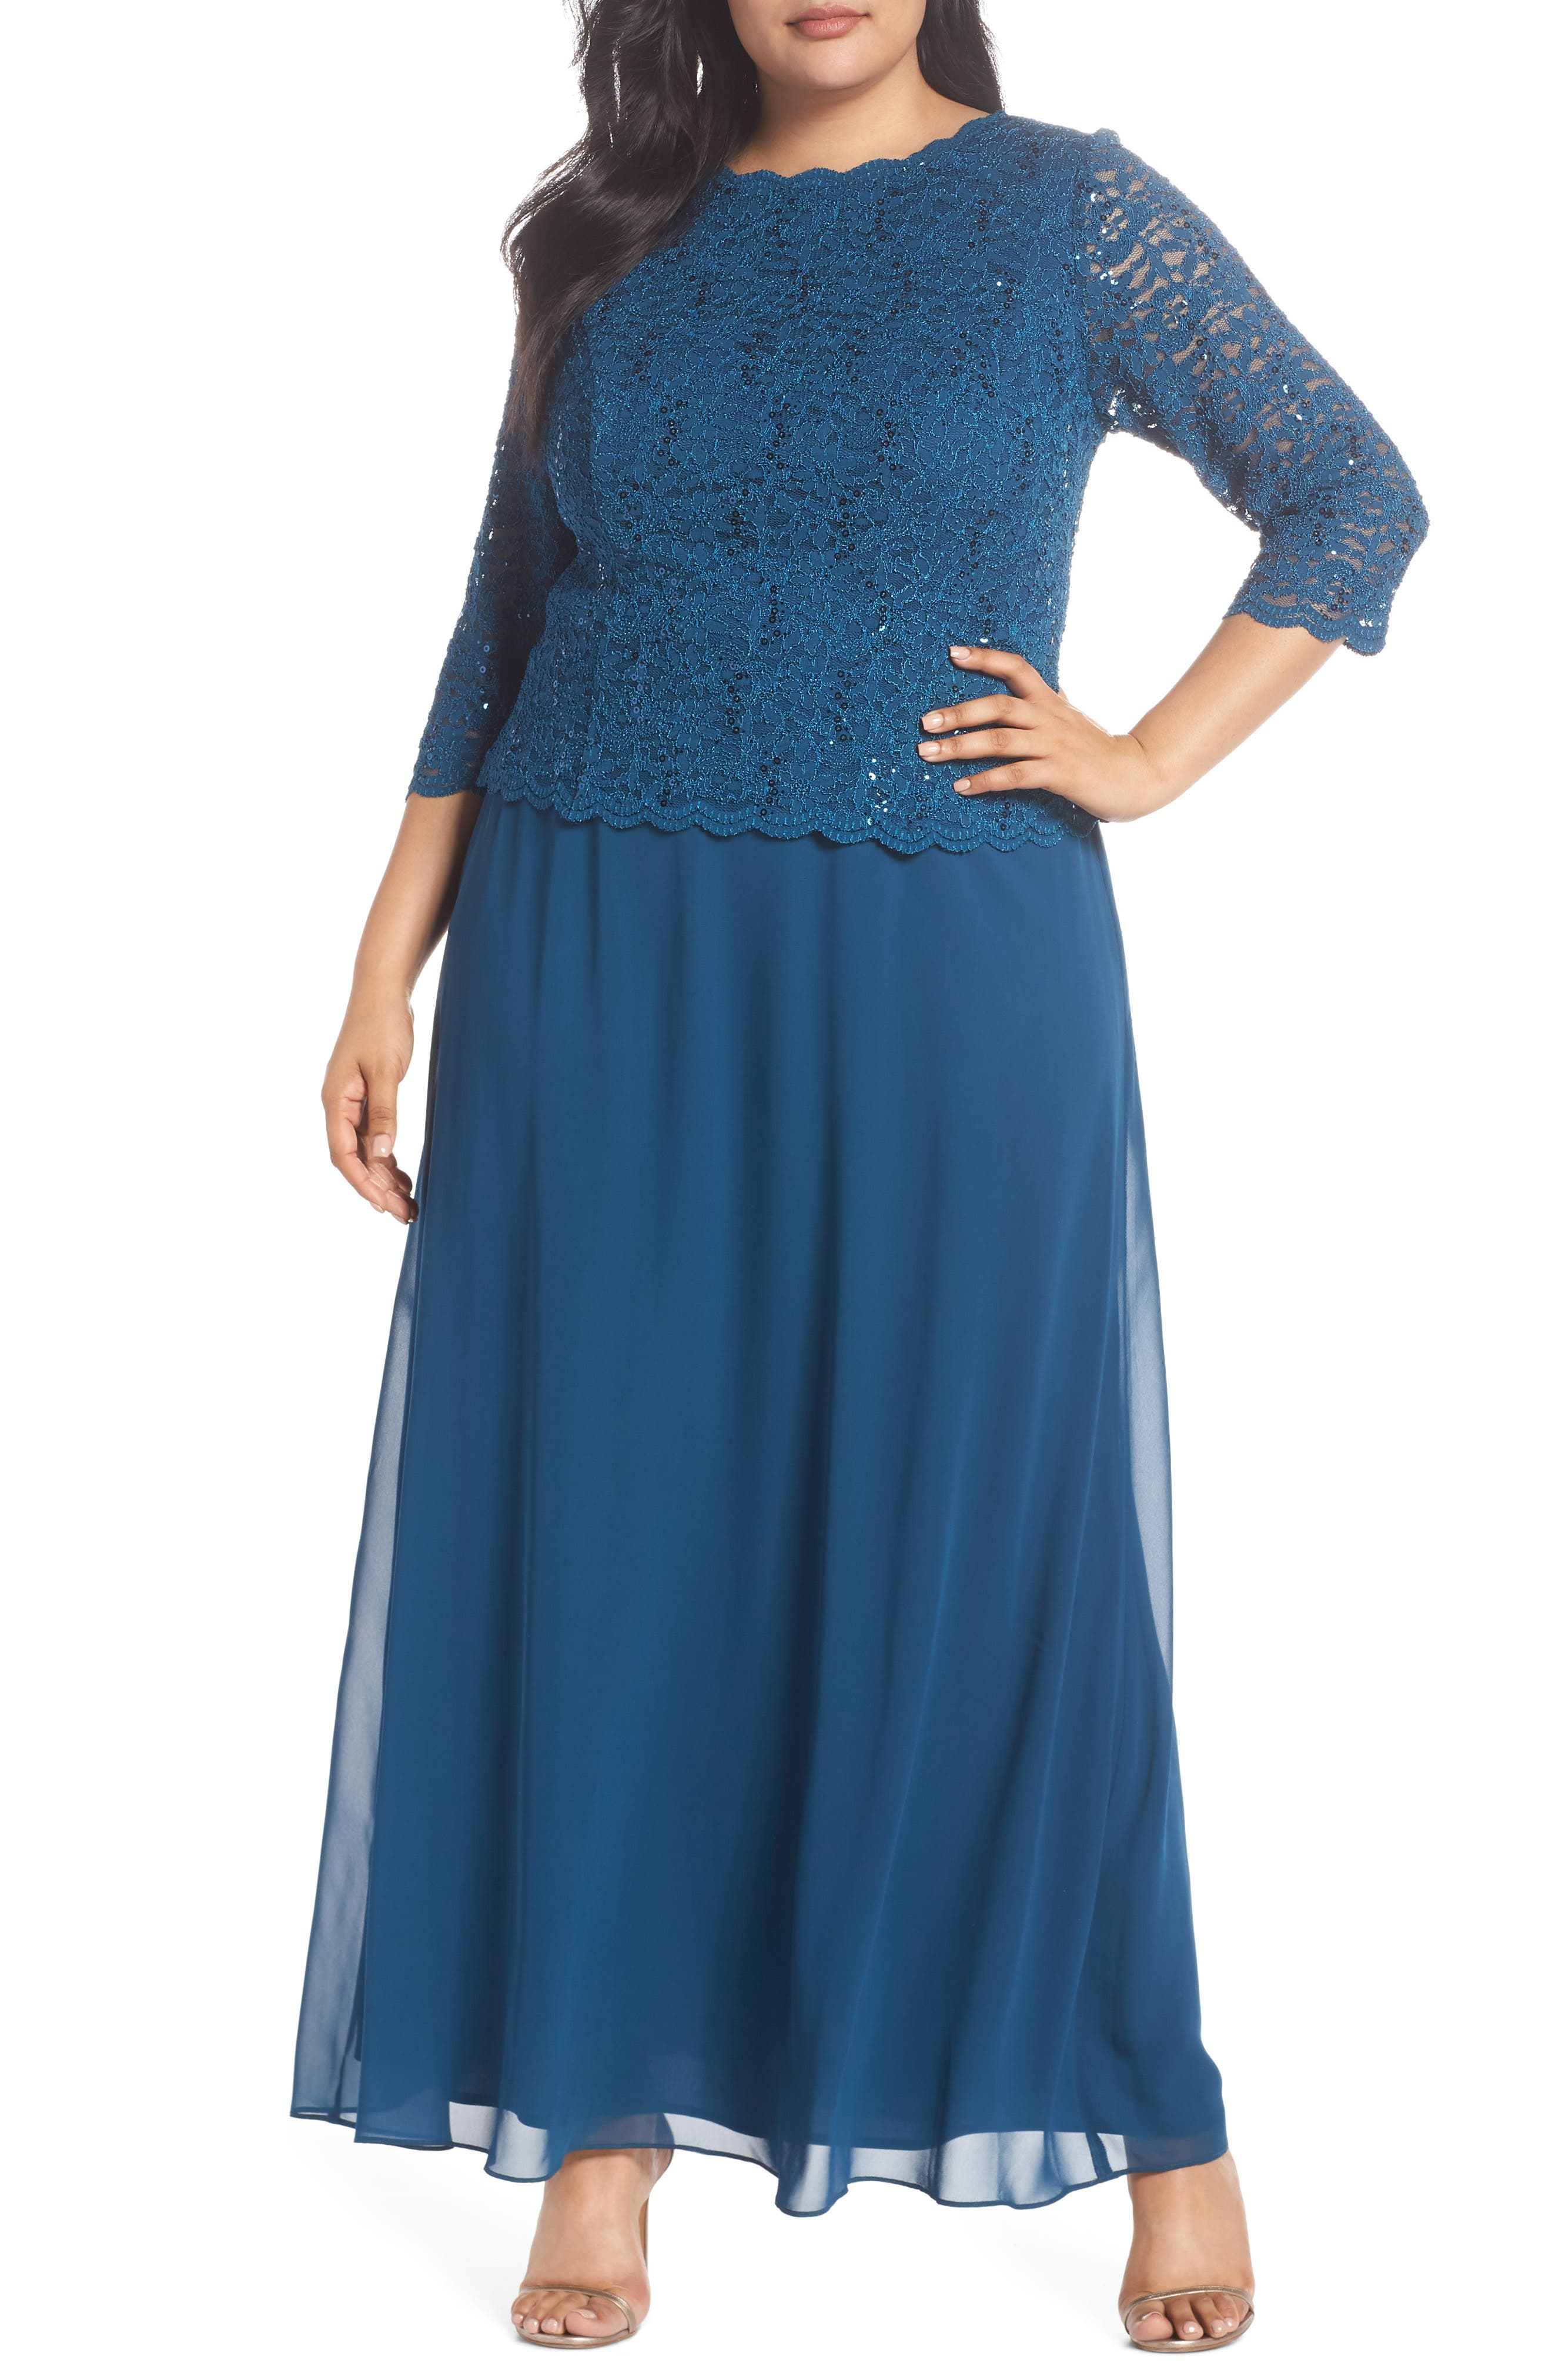 Vintage Dresses for Mother of the Bride